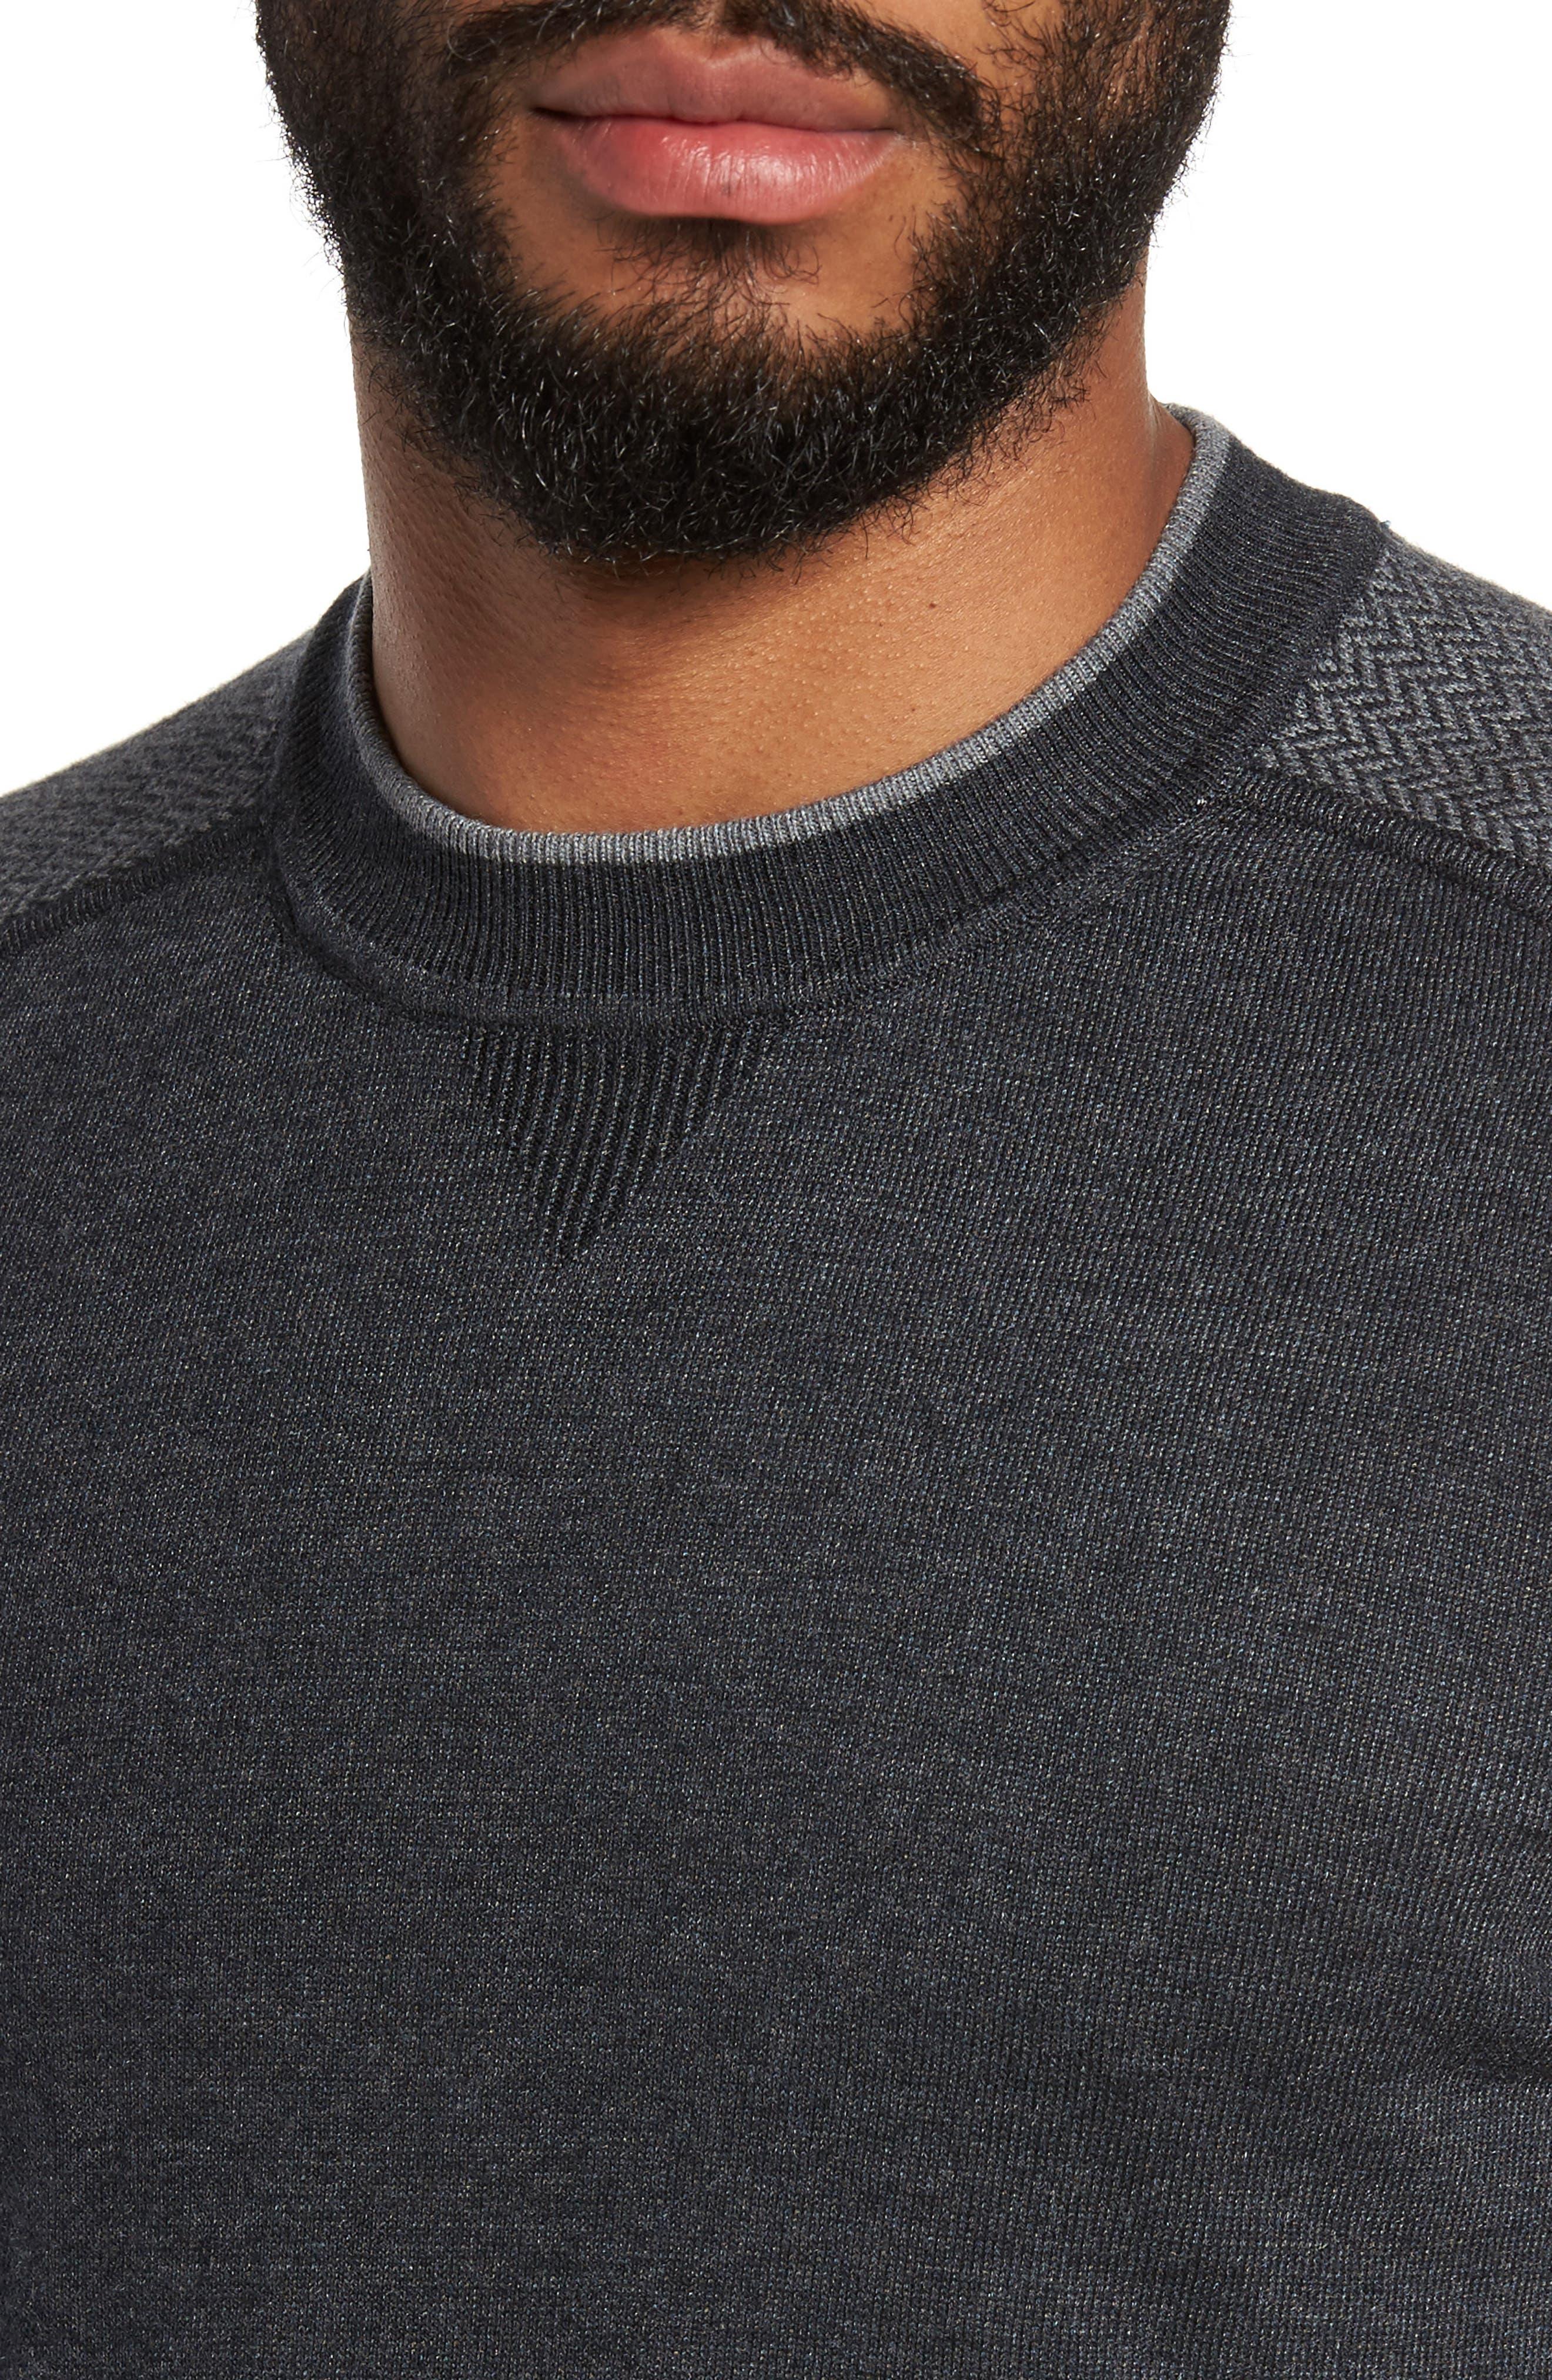 Pepmint Herringbone Sleeve Sweatshirt,                             Alternate thumbnail 7, color,